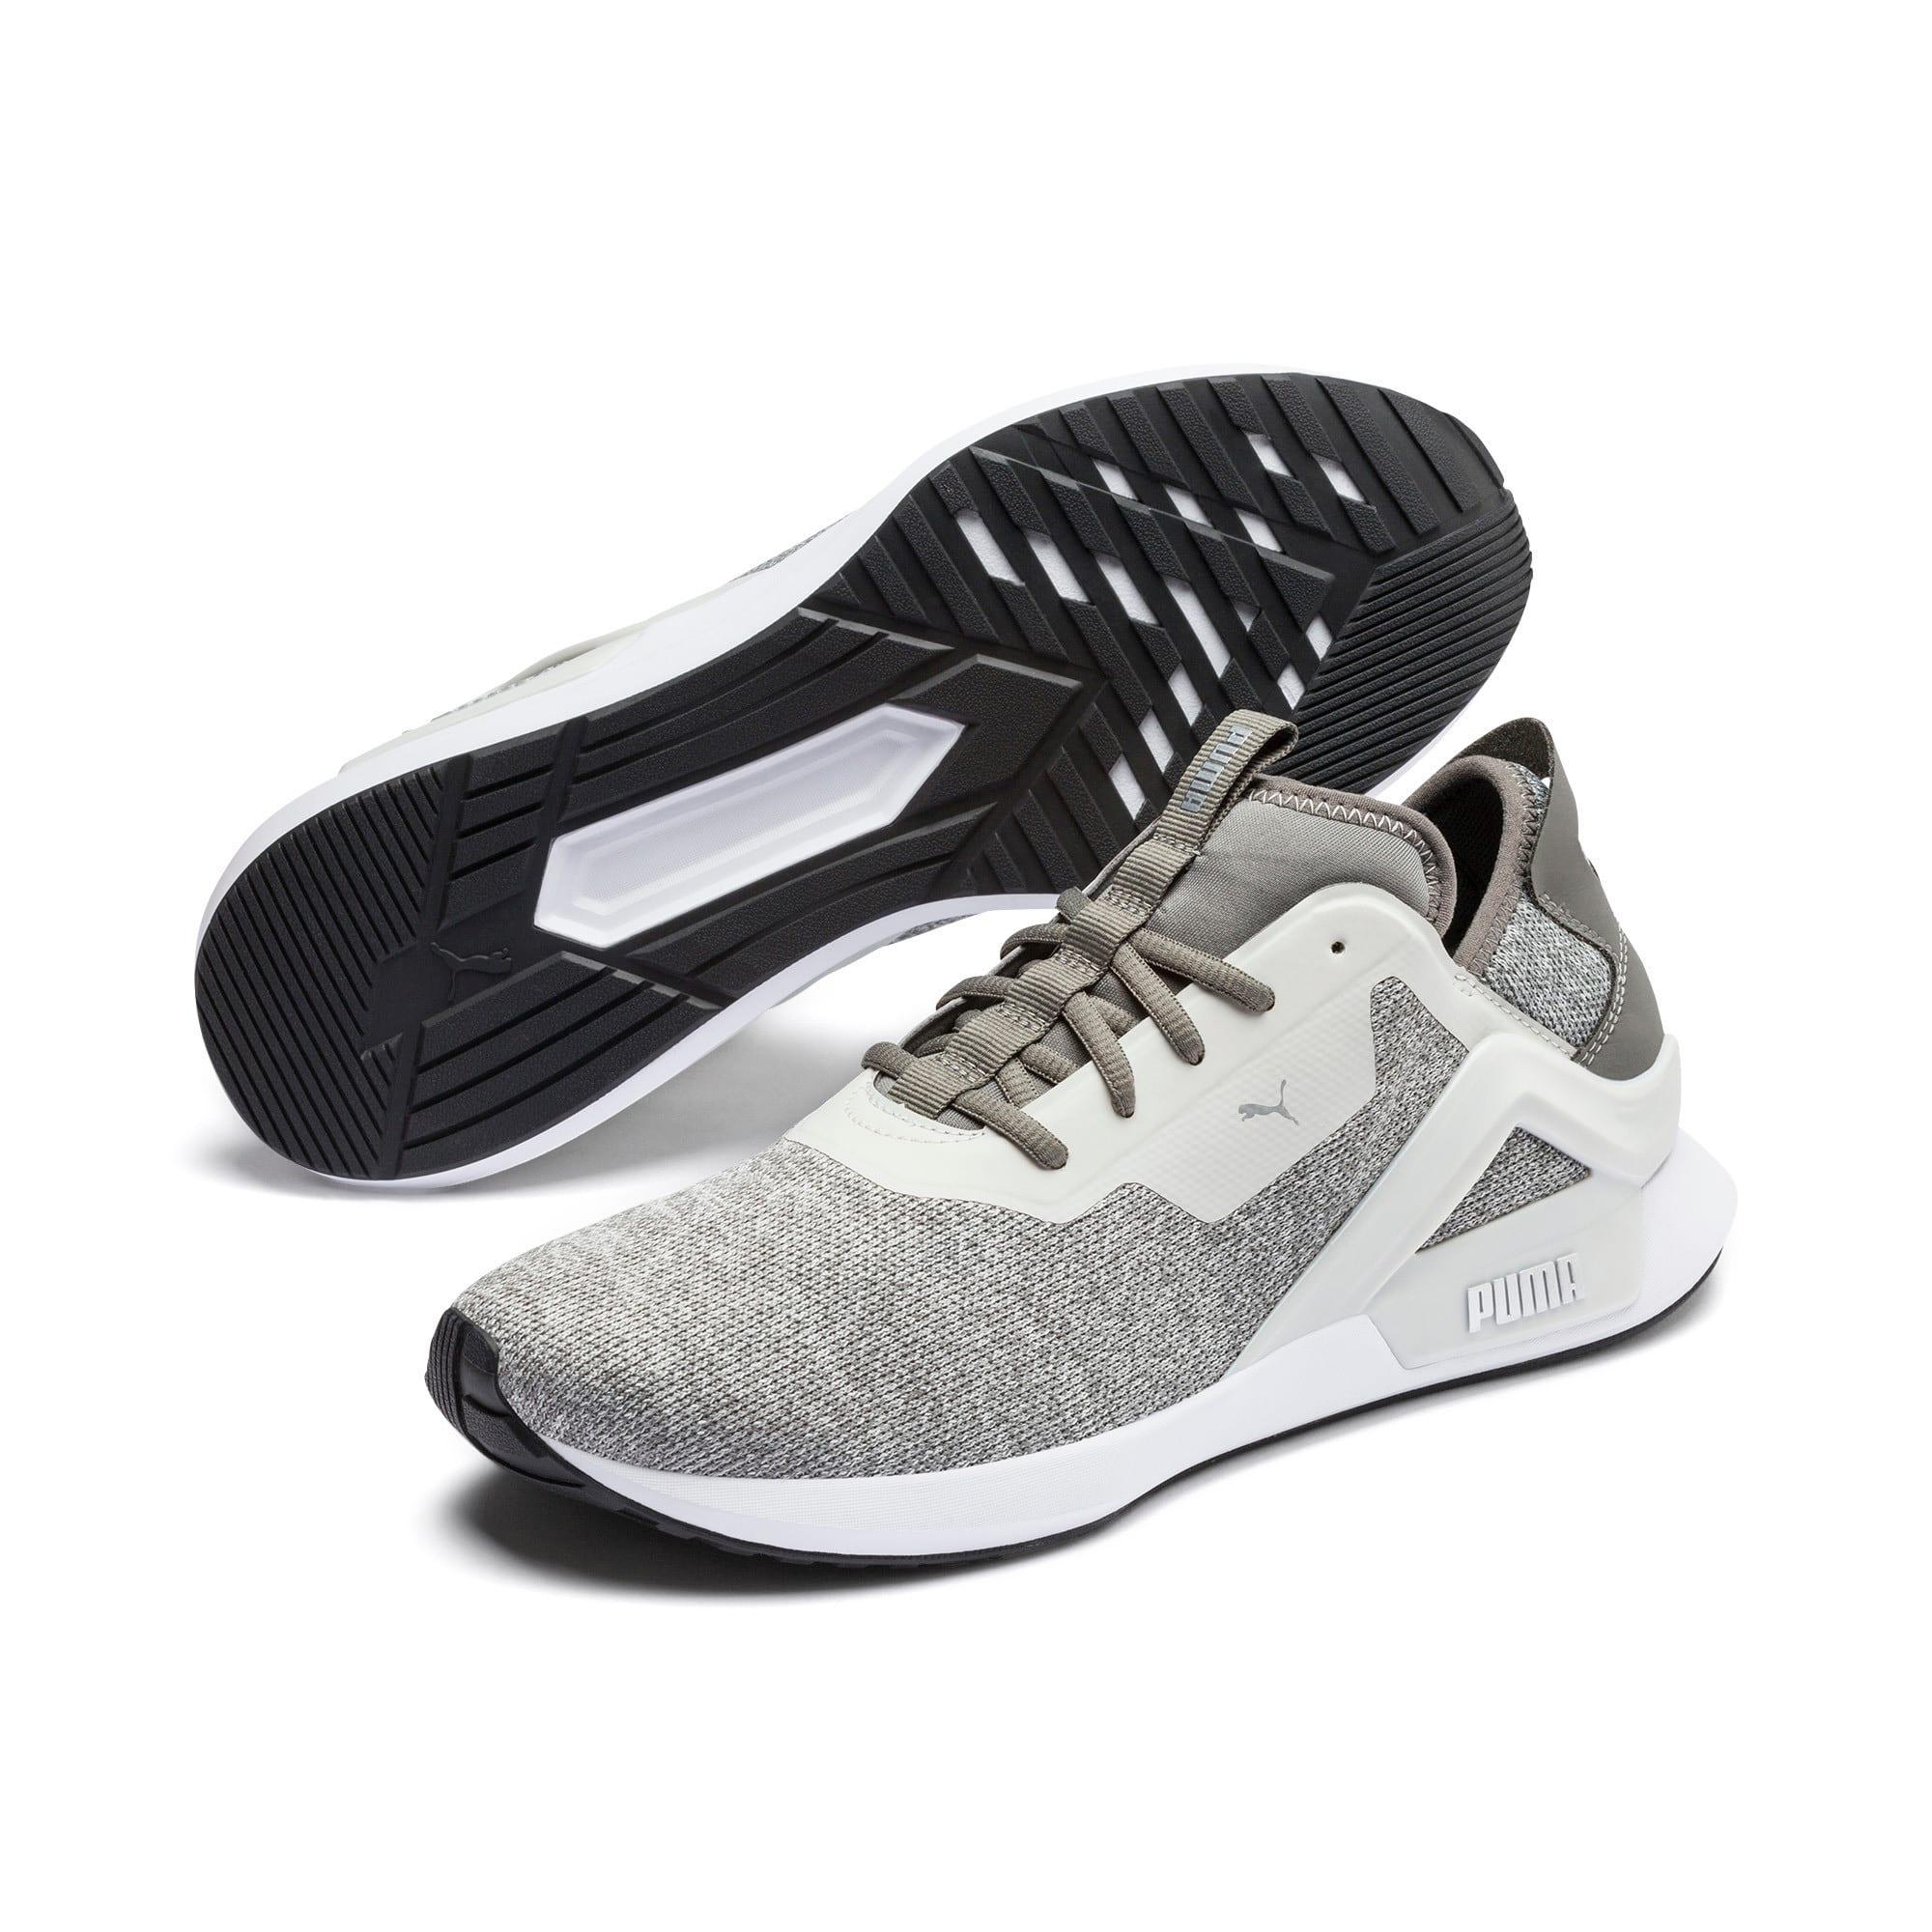 Thumbnail 3 of Rogue X Knit Herren Sneaker, CASTLEROCK-Glacier Gray, medium